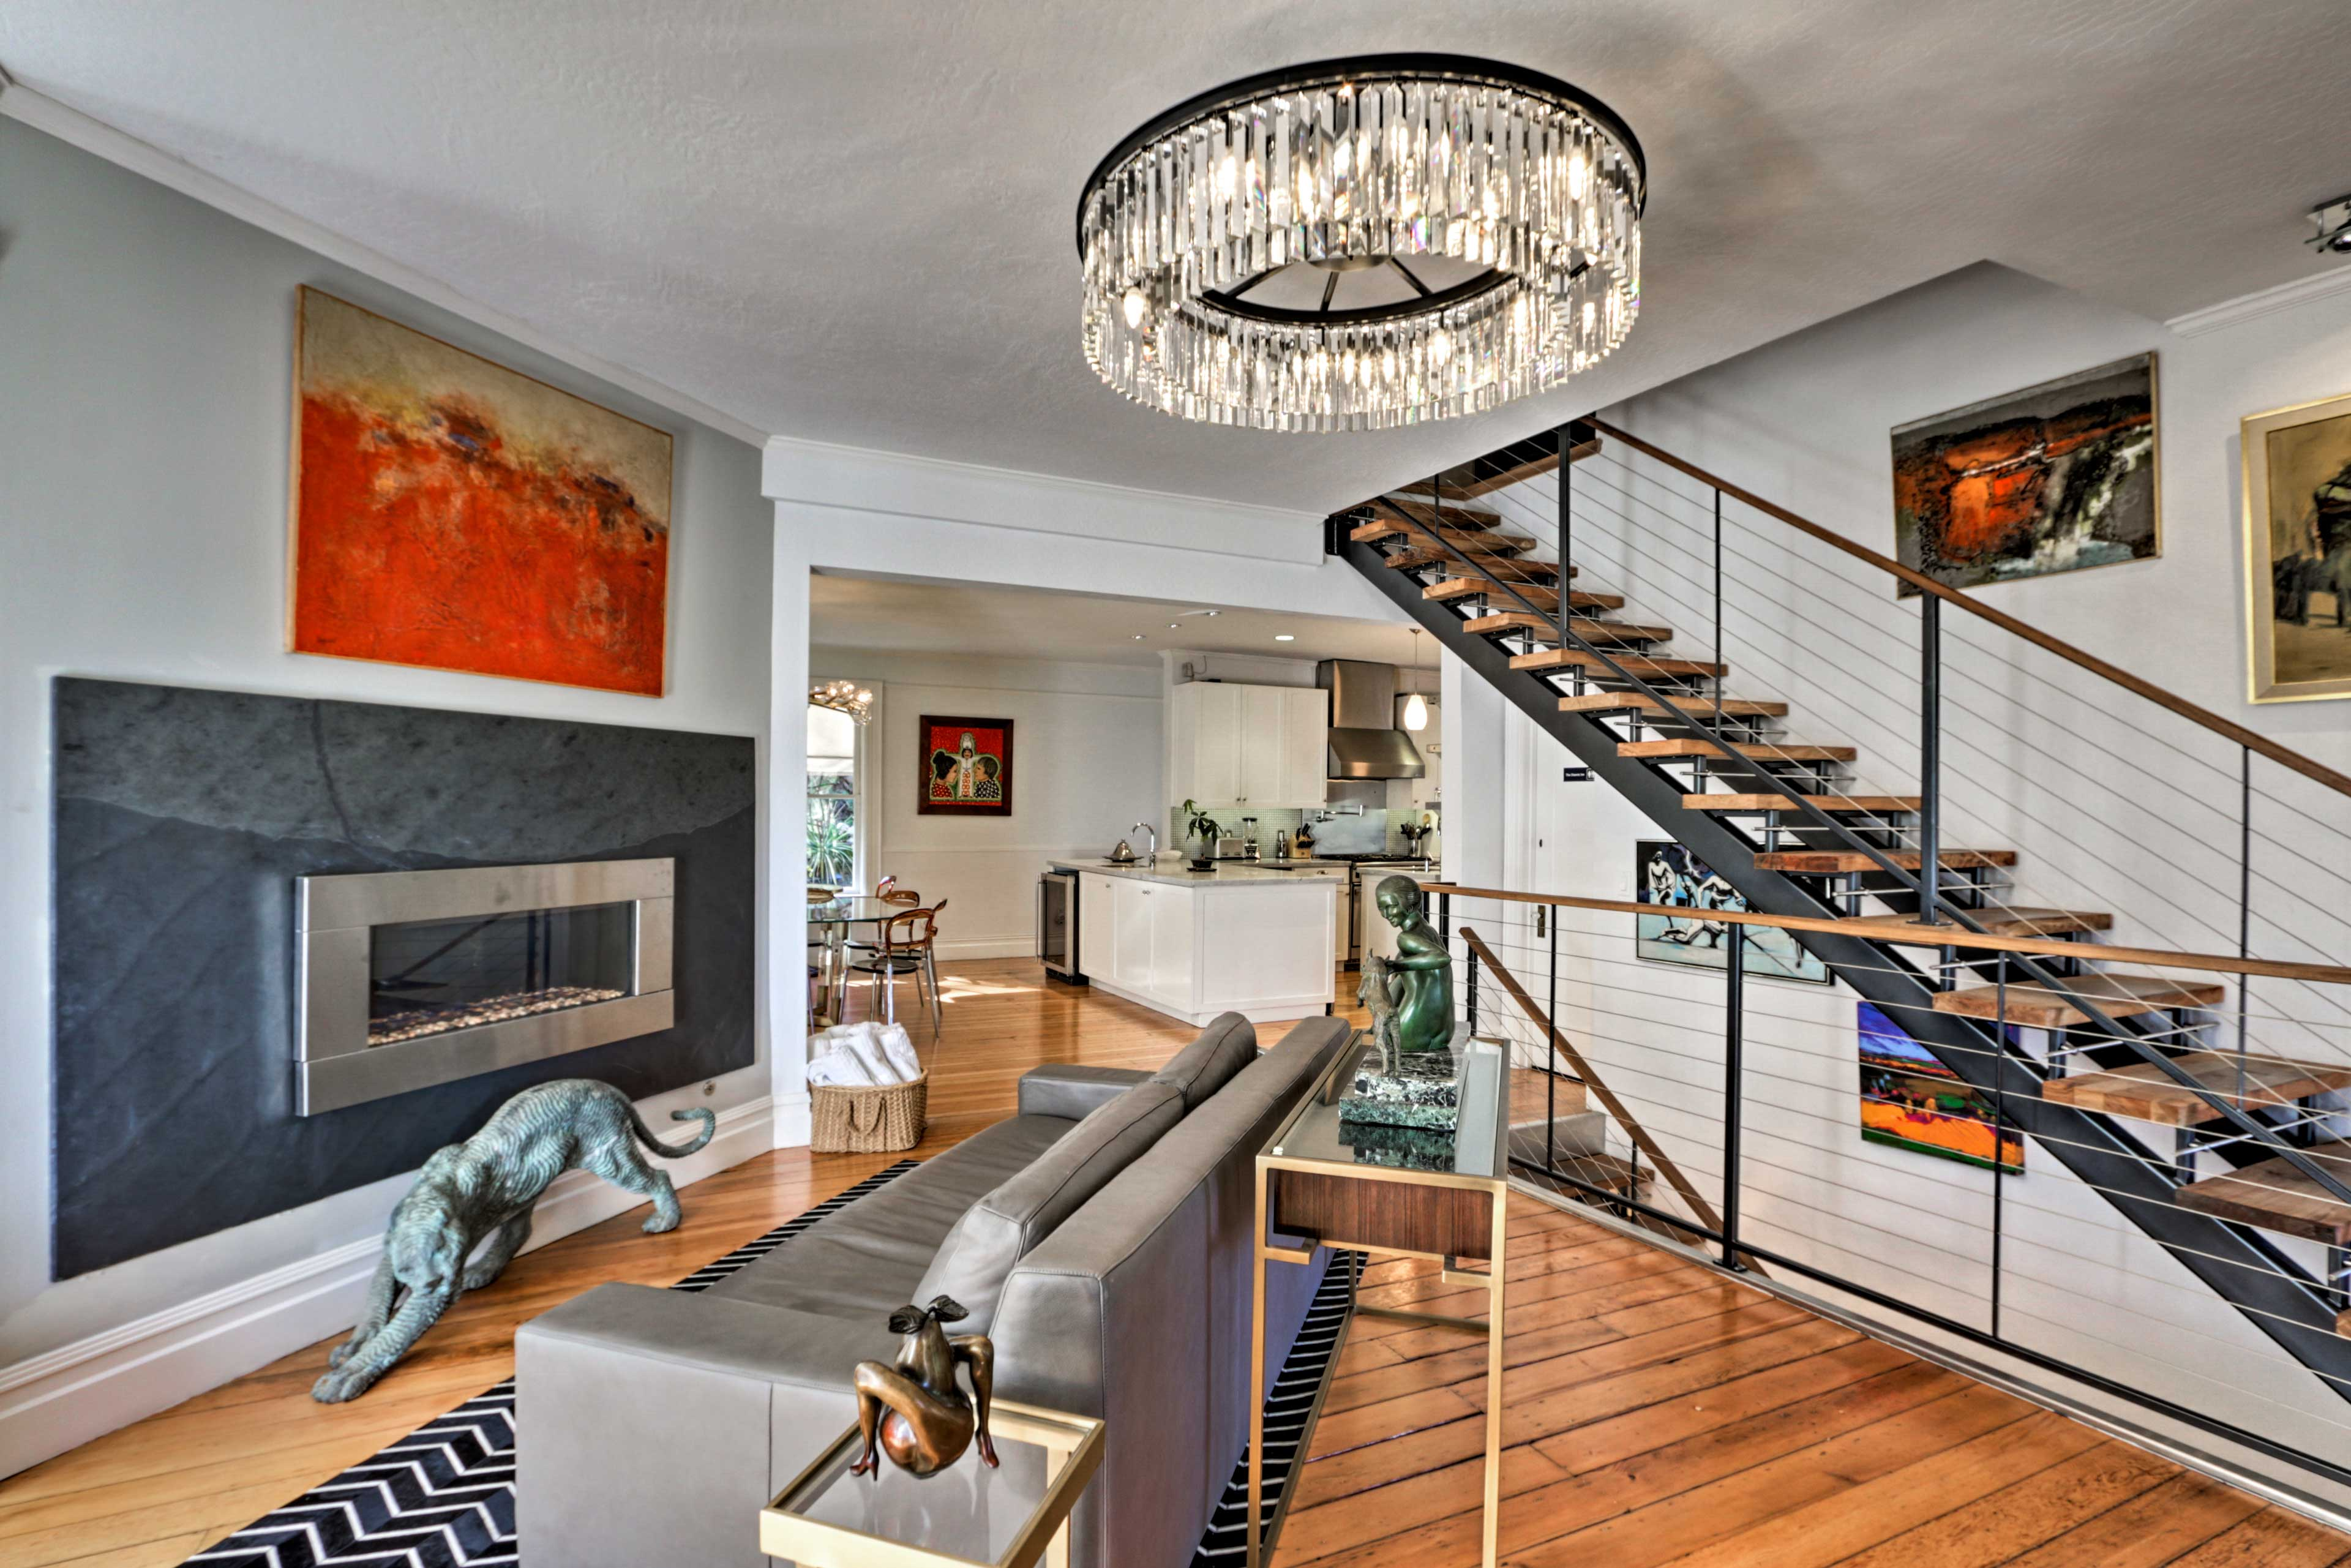 The lavish interior will make you feel like royalty.